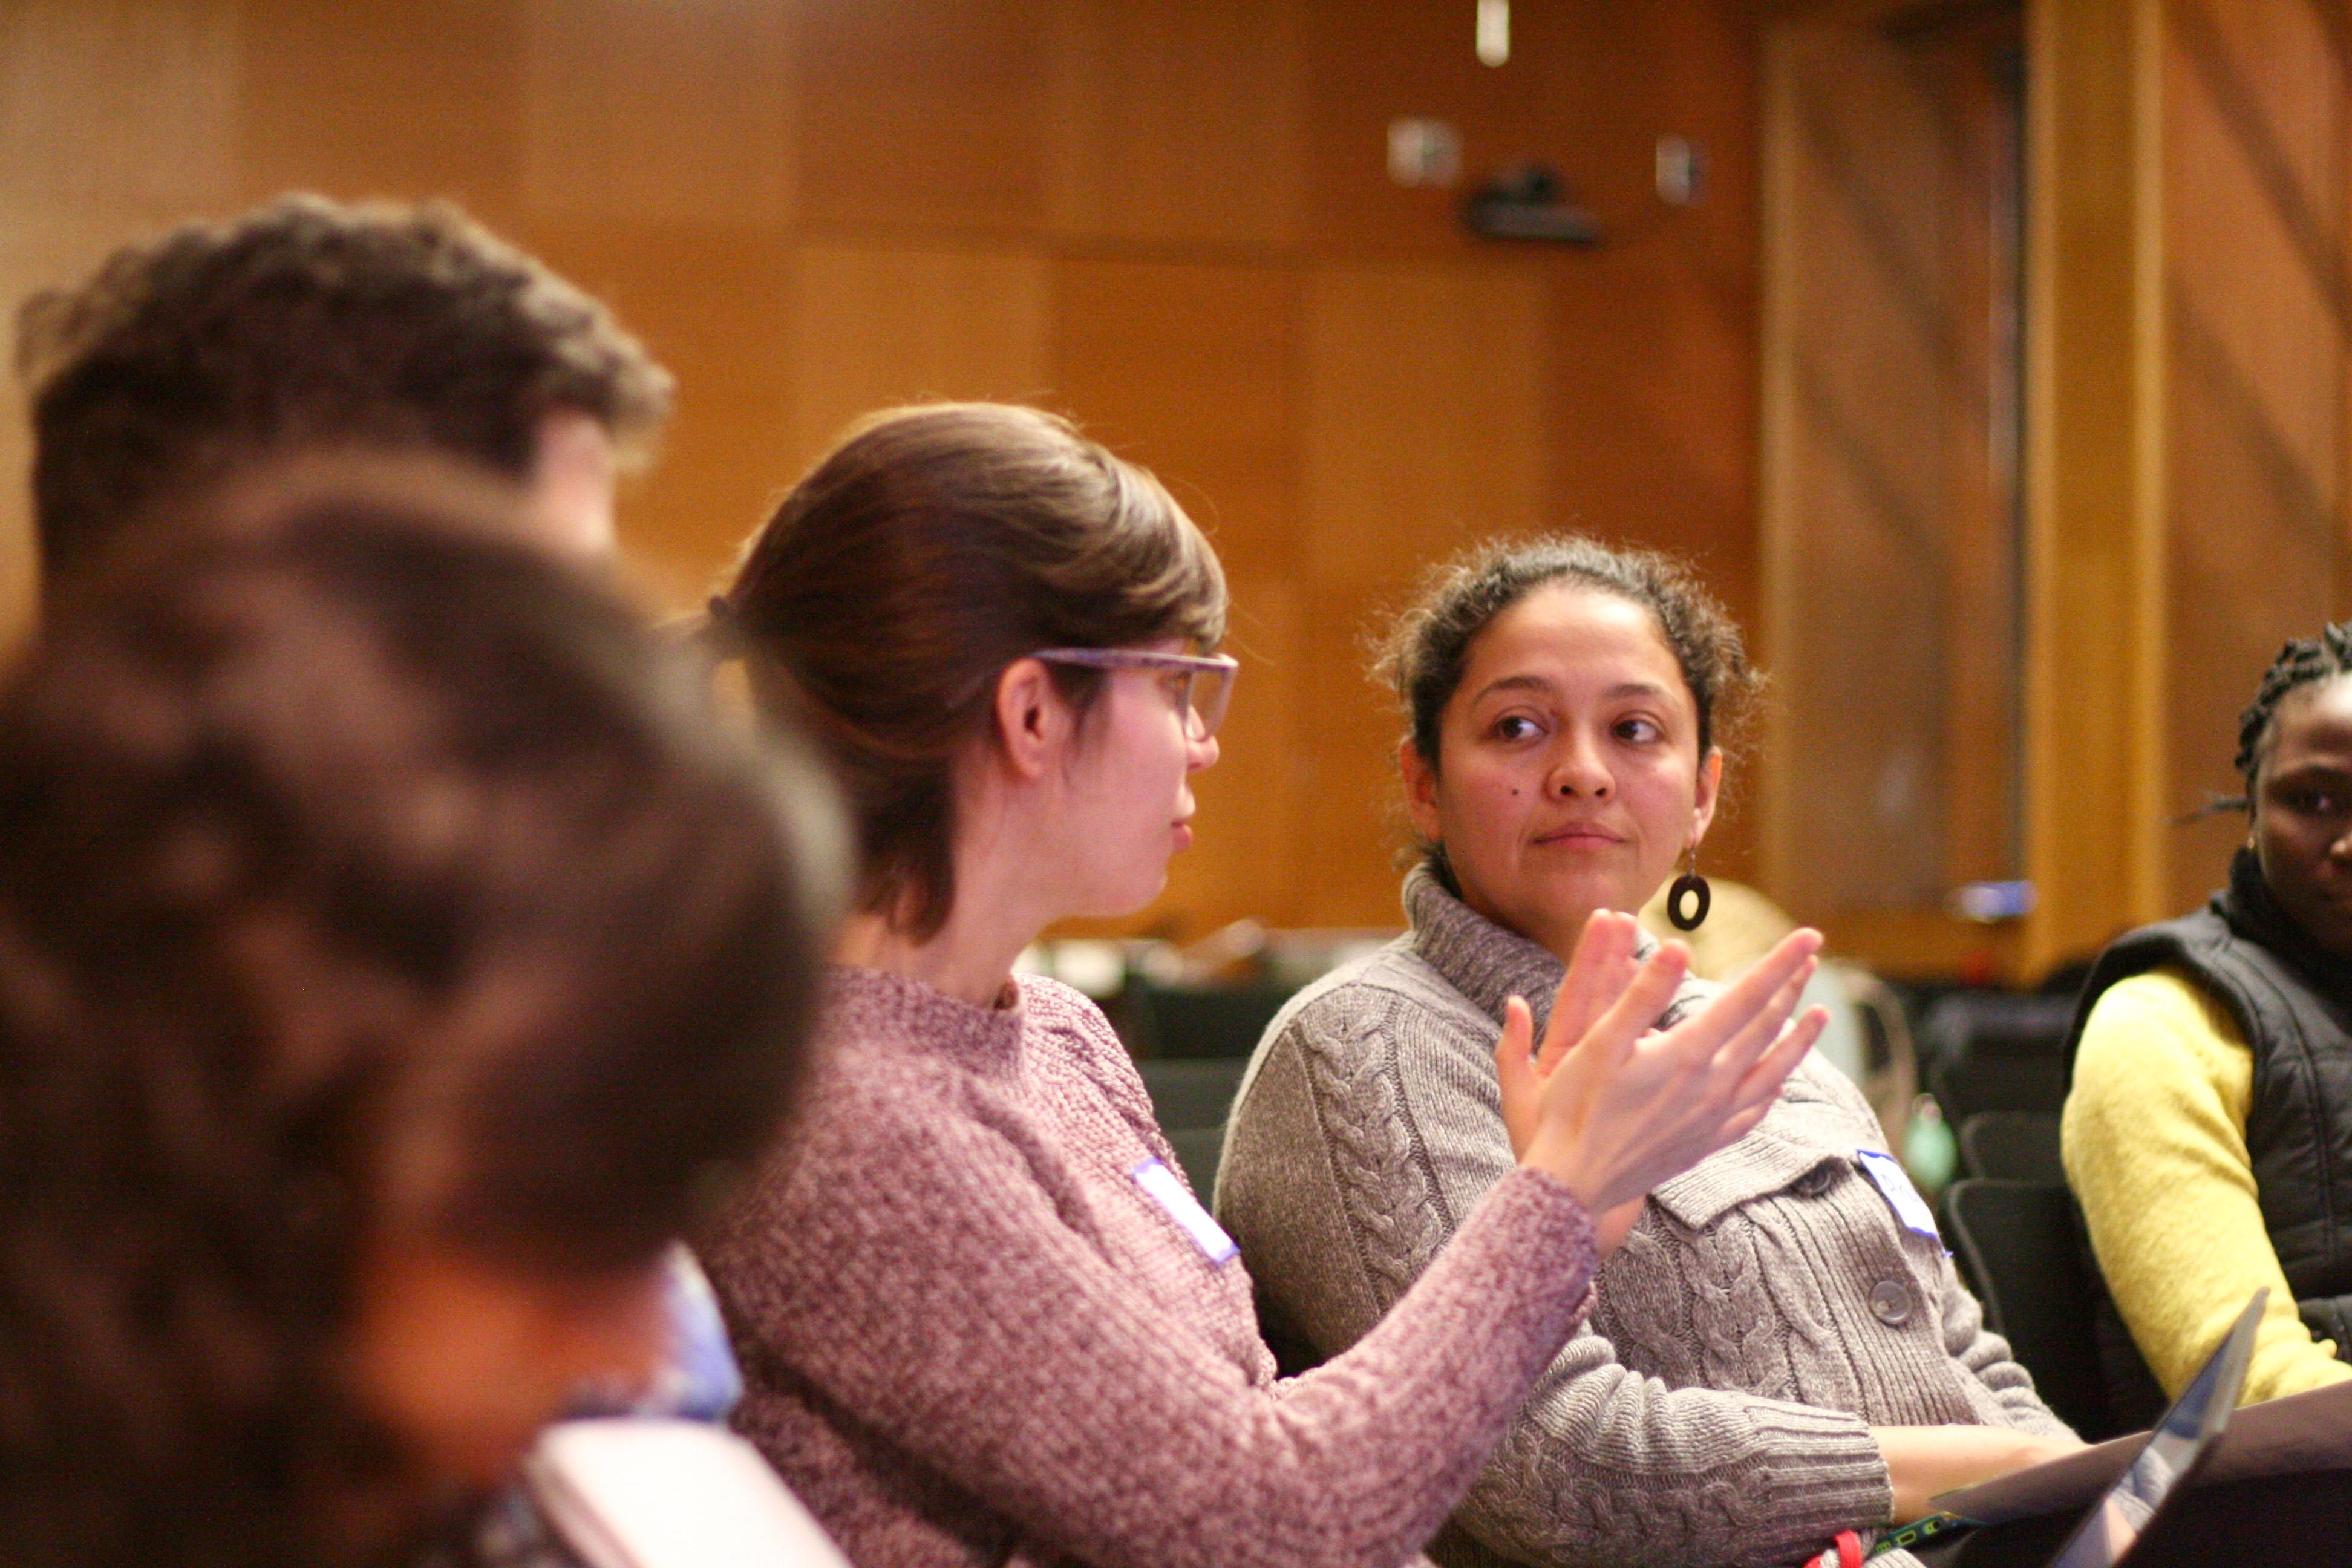 Mariana Amorim and Anyi Mazo Vargas discuss career preparation